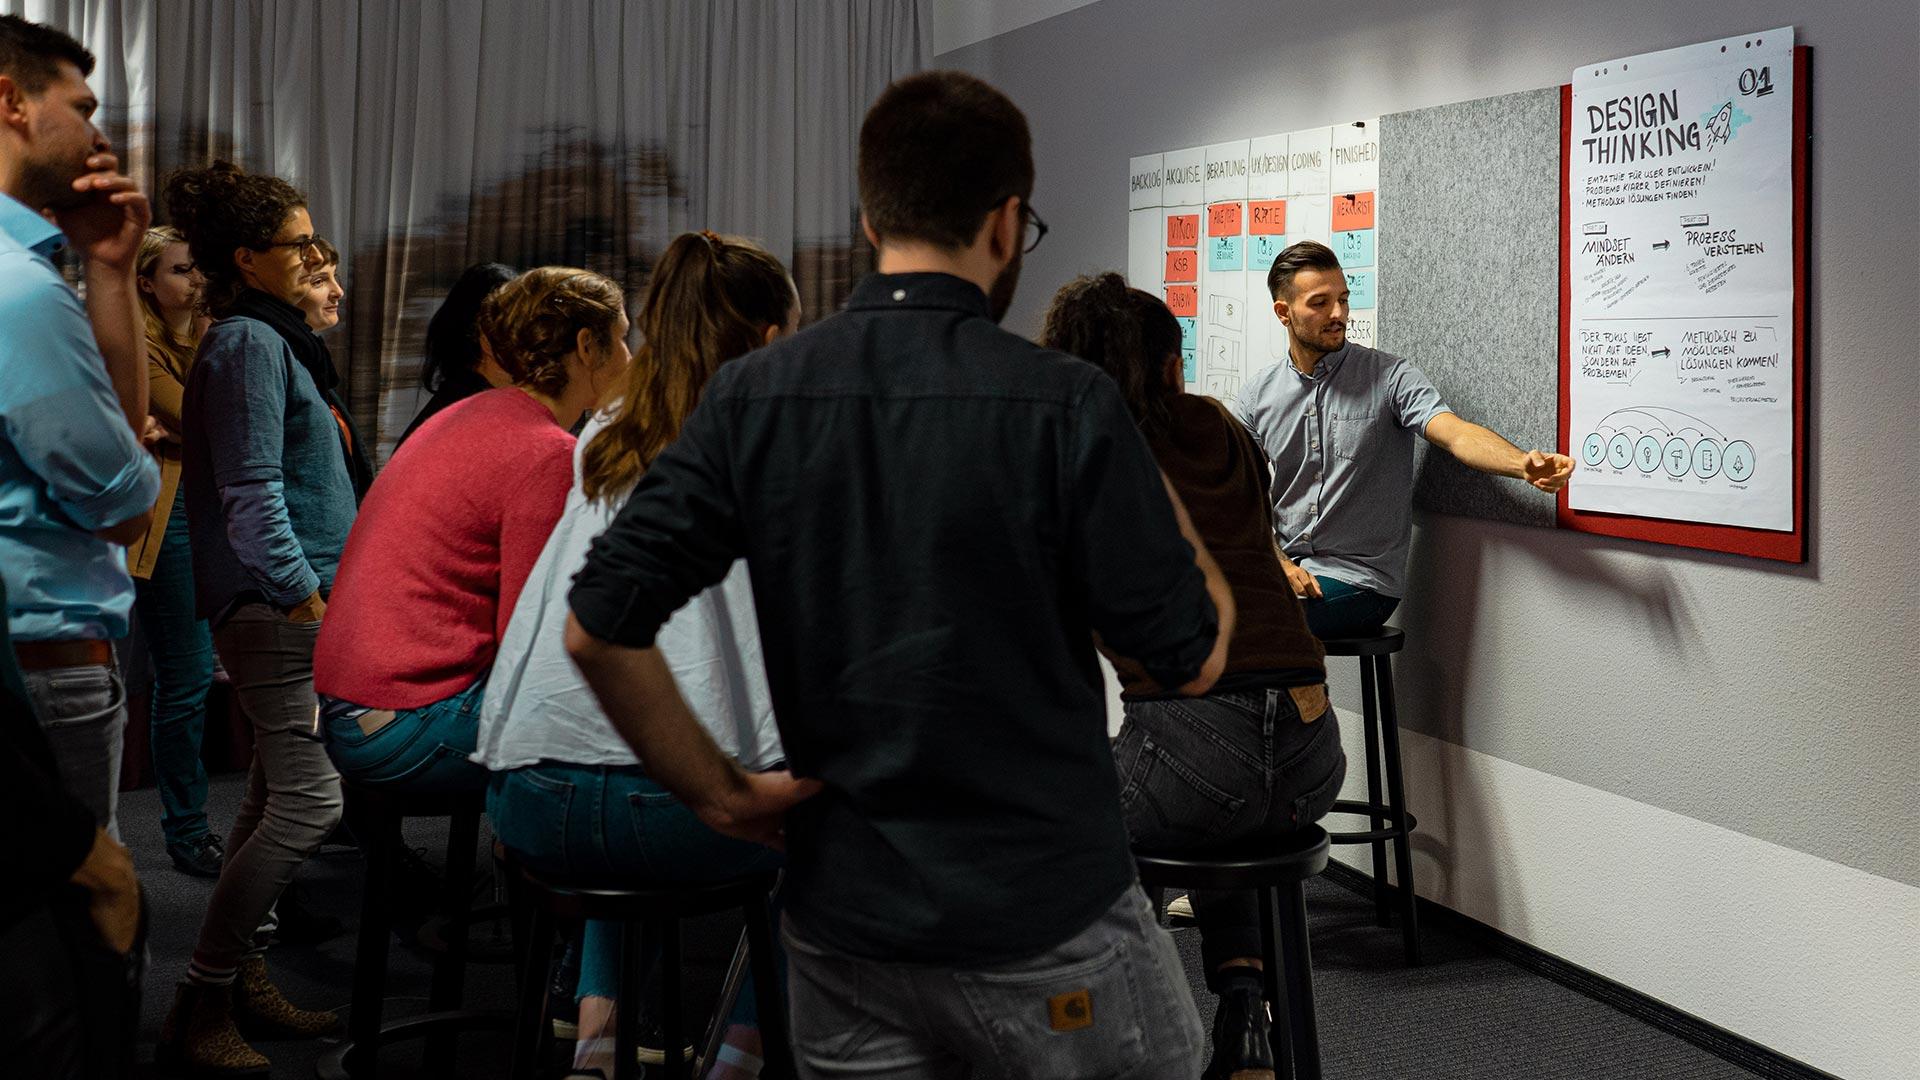 HelloCreate Behavioural Design Training